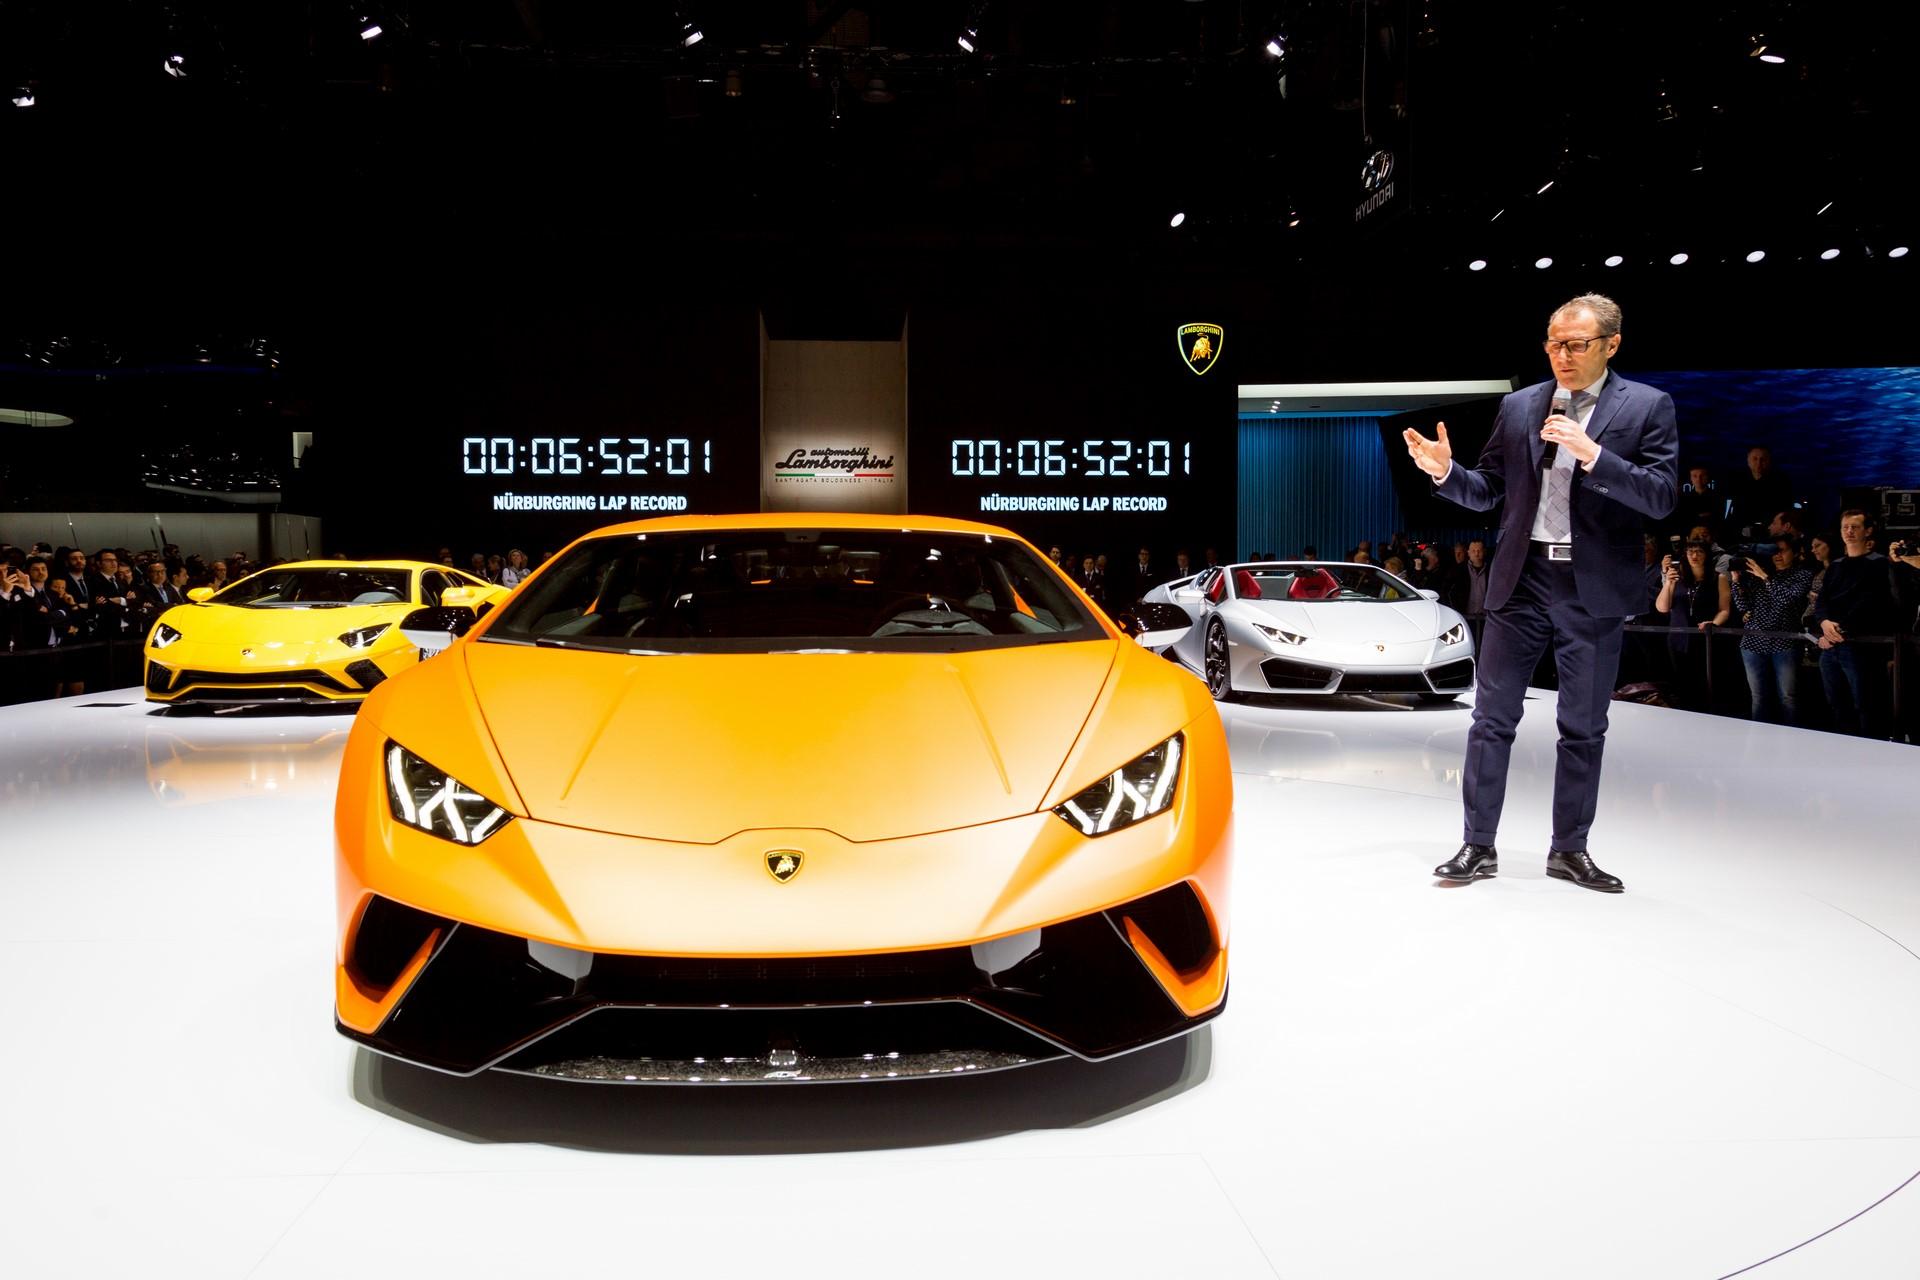 Stefano Domenicali Lamborghini Huracan Performante Geneva 2017 (2)